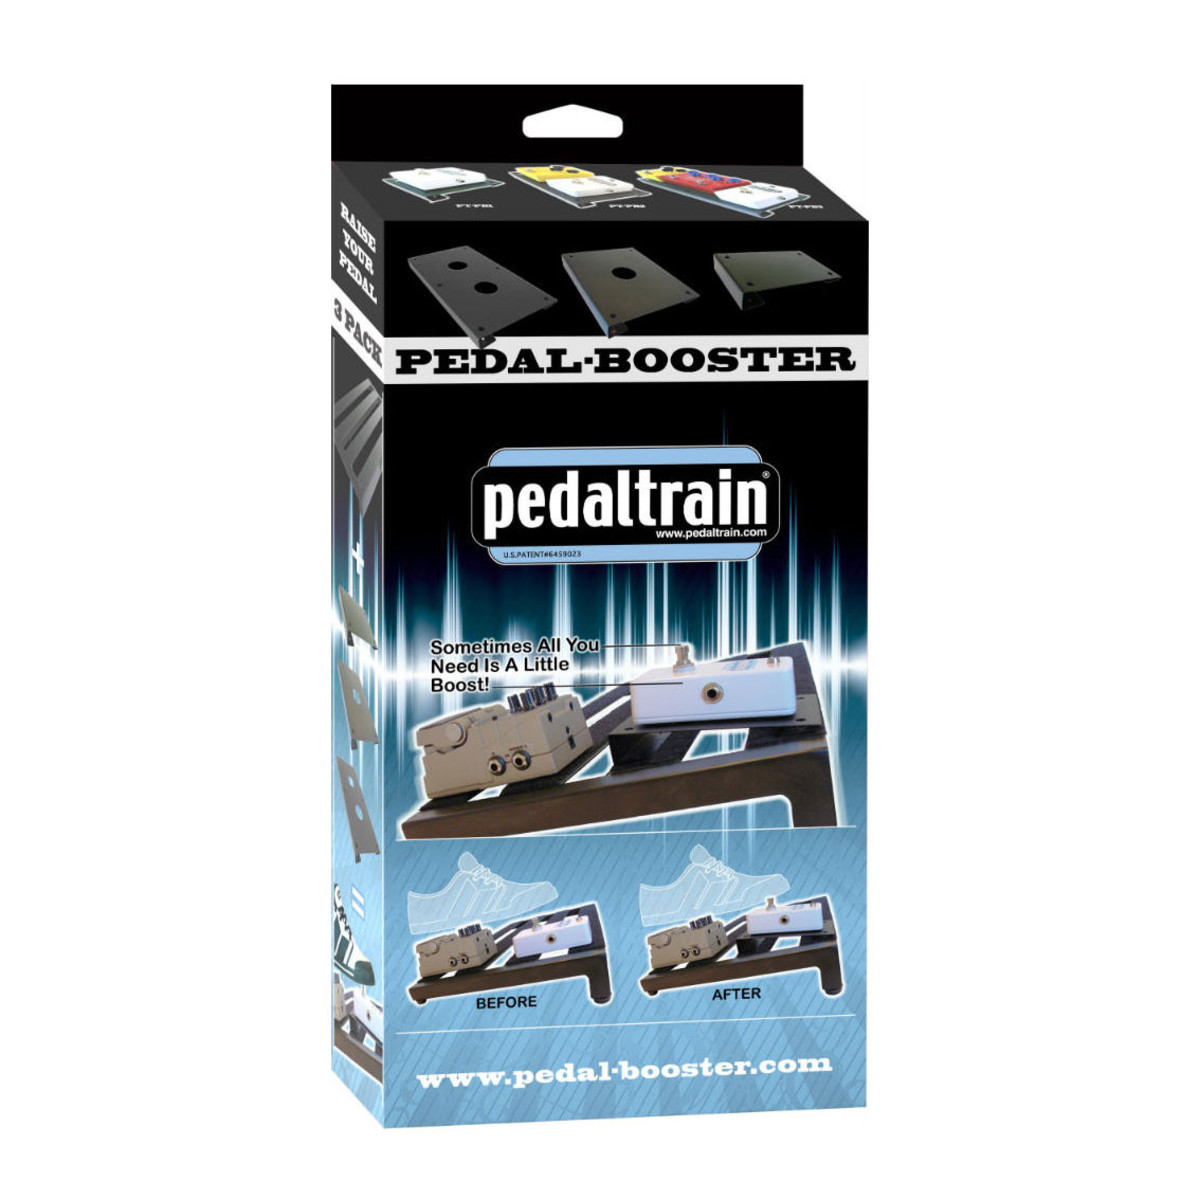 pedaltrain pedal booster kit at. Black Bedroom Furniture Sets. Home Design Ideas